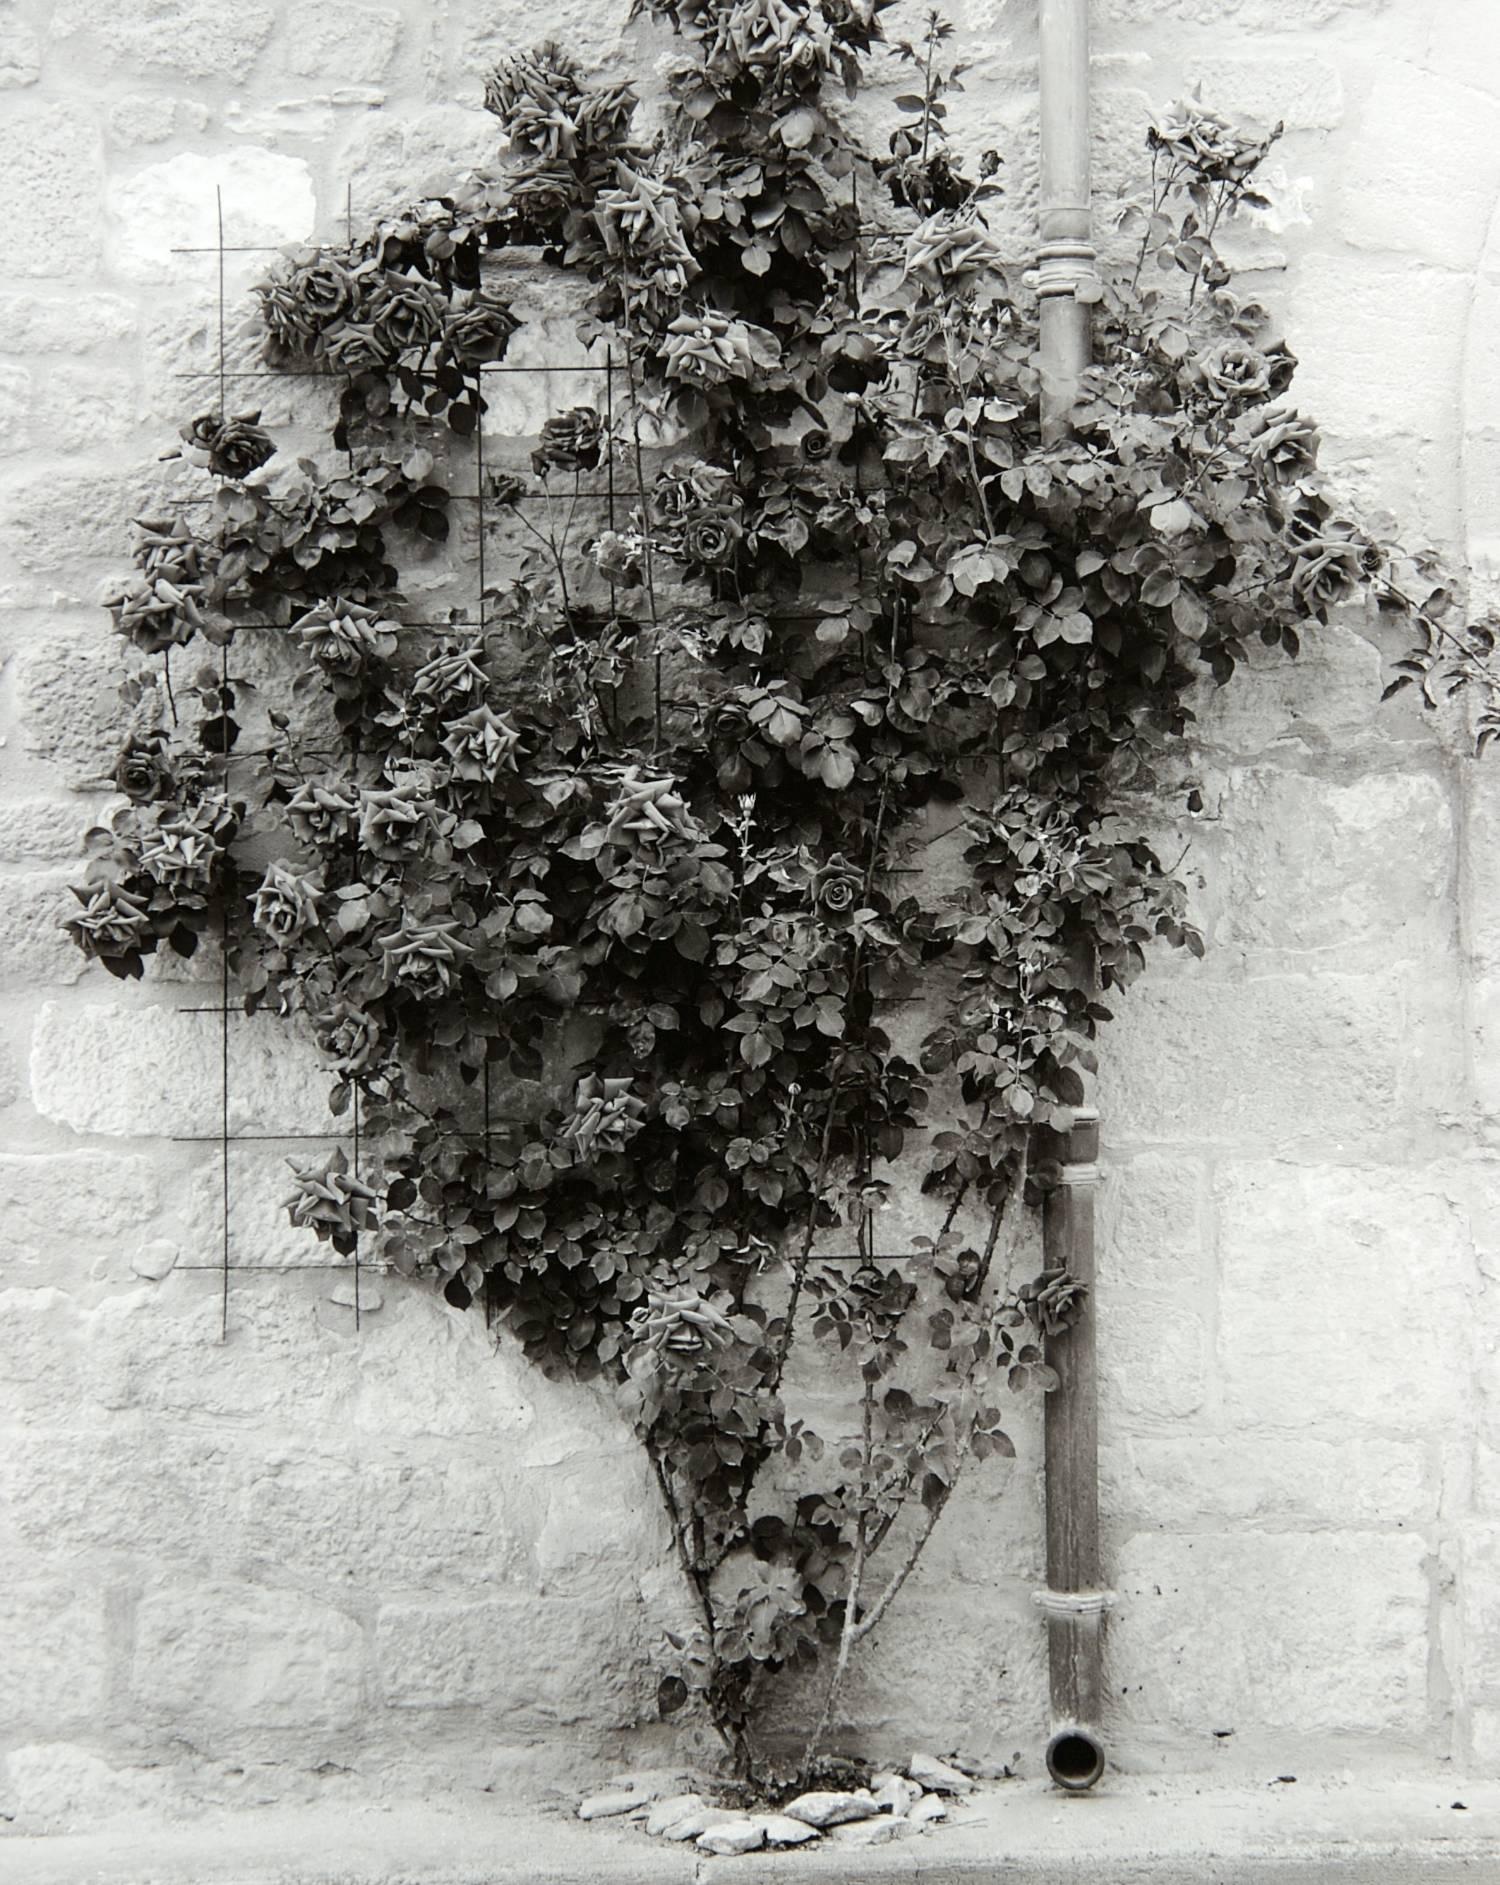 Roses (Saint-Cyprien, France)